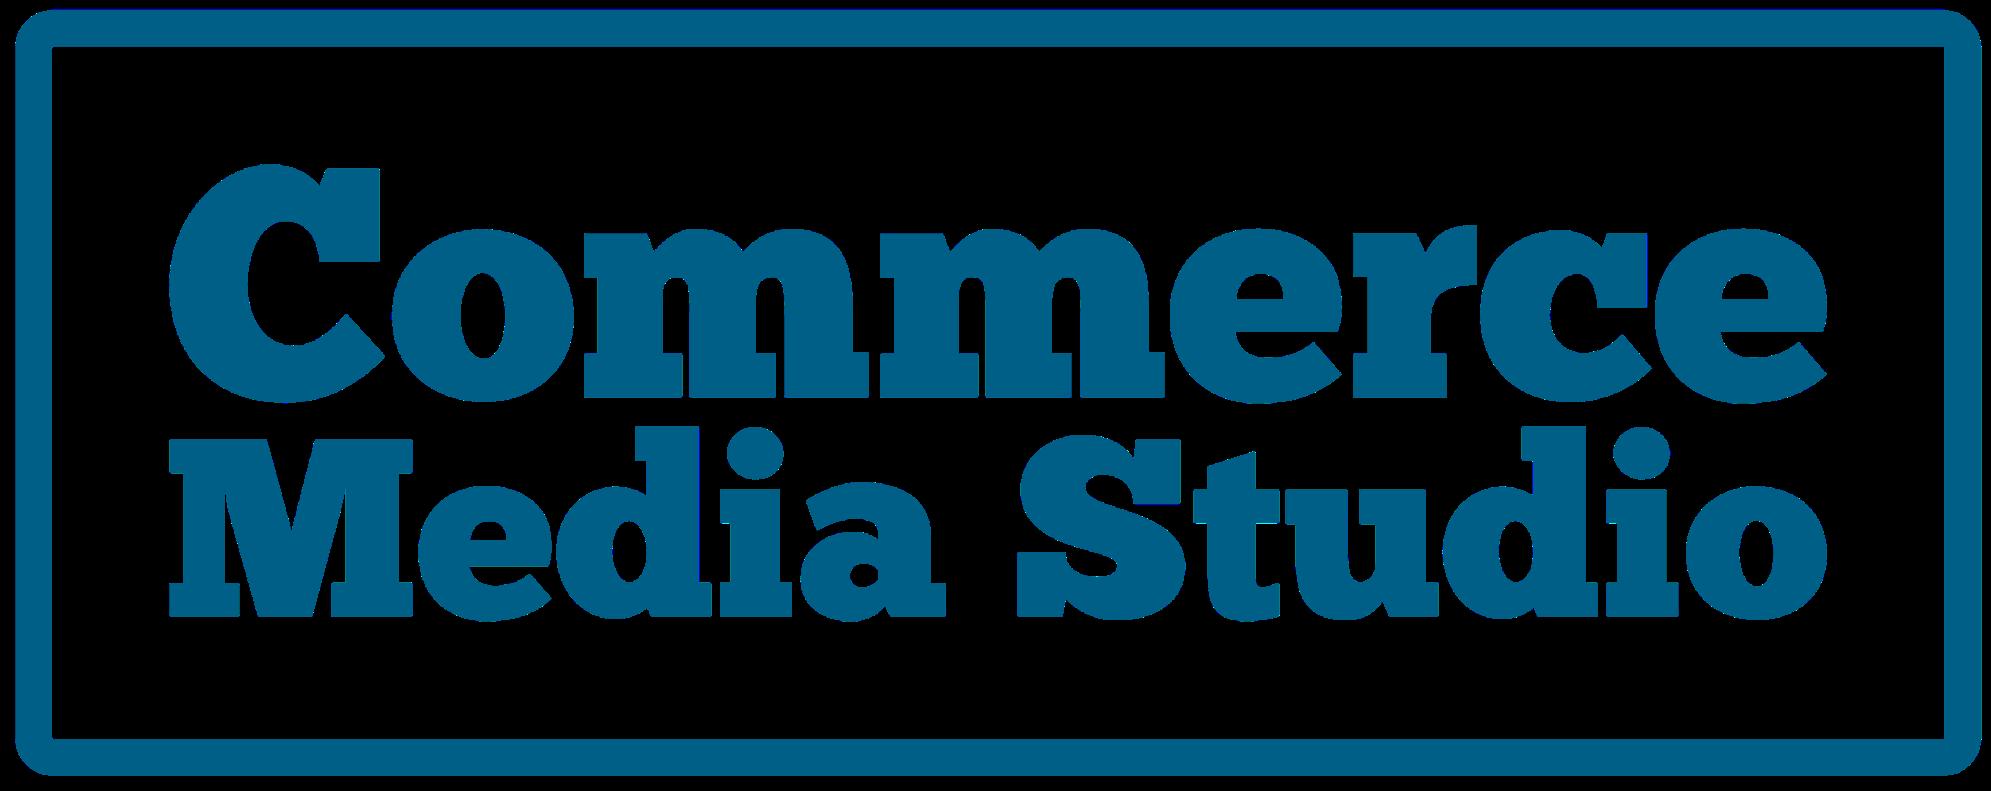 CommerceMedia.Studio Logo